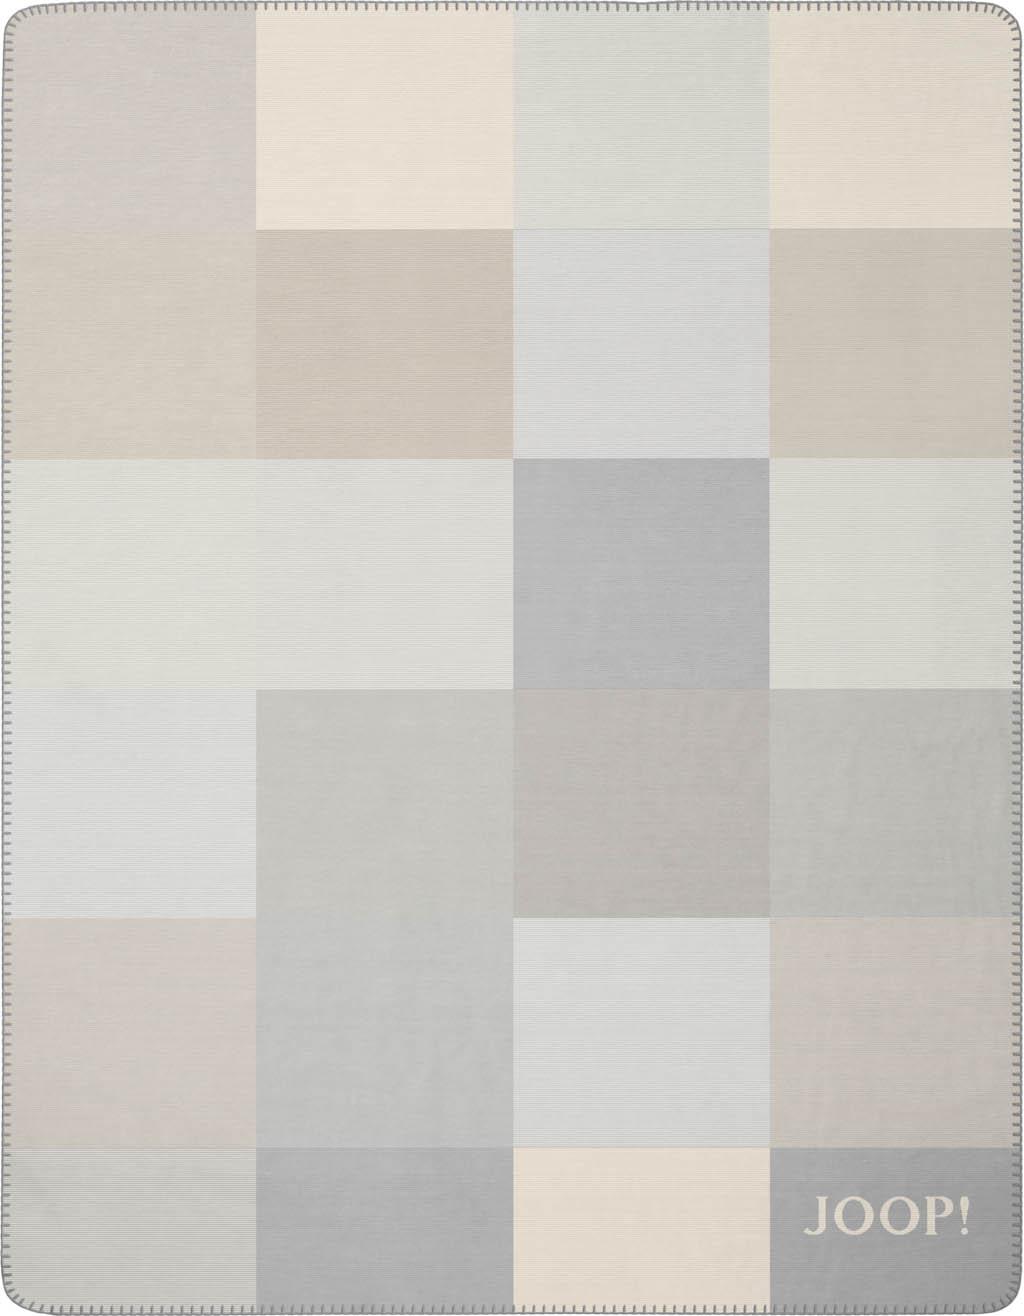 JOOP! Wohndecke Mosaic 751539 Sand-Rauch 150x200 cm neue Kollektion